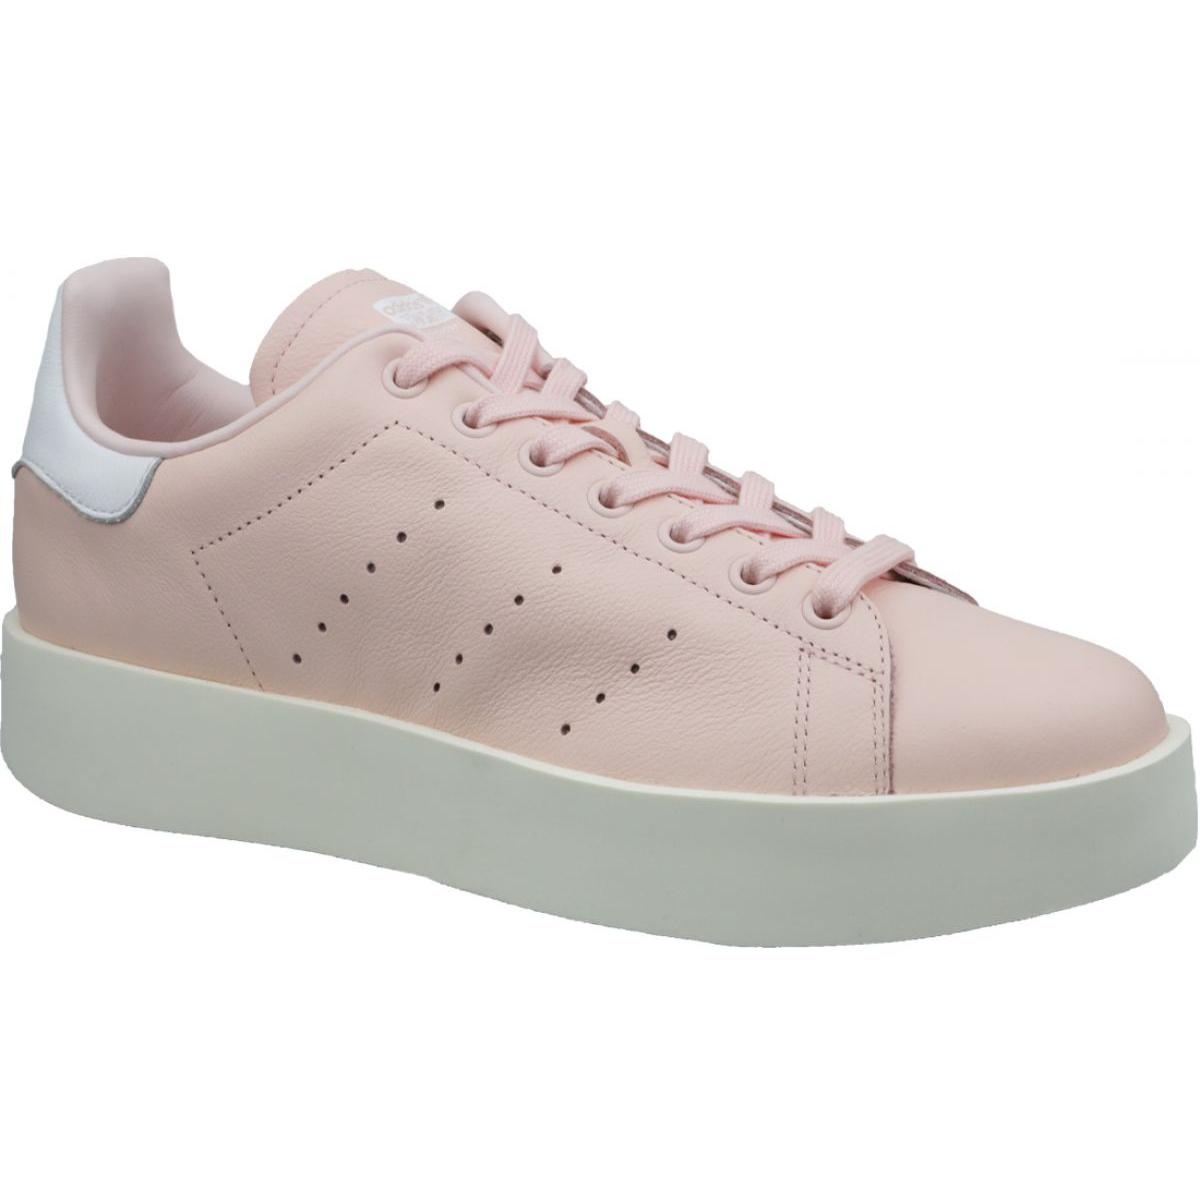 Stan Smith M By2970 Adidas Bold Schuhe Braun QxsthrodCB